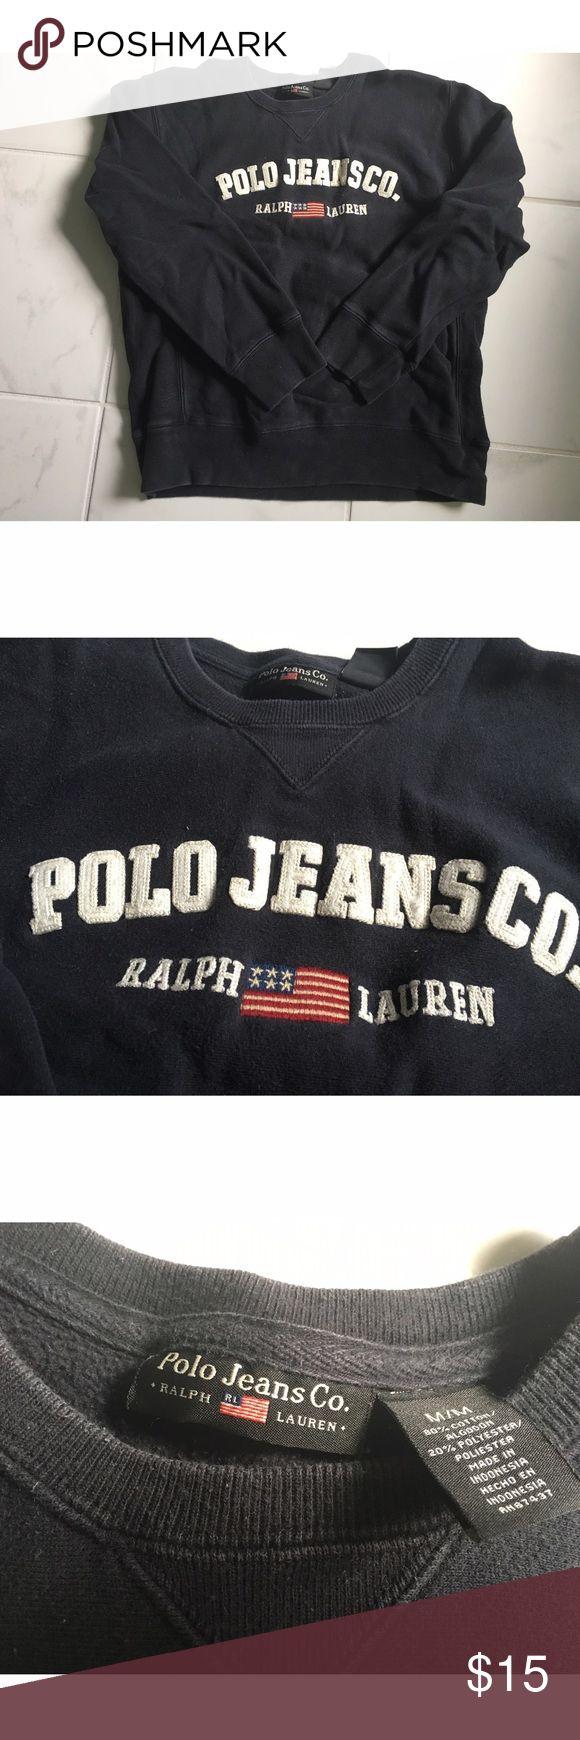 Vintage polo Ralph Lauren crewneck Vintage navy blue polo crewneck. Says women's medium, but fits more like a small. Polo by Ralph Lauren Tops Sweatshirts & Hoodies